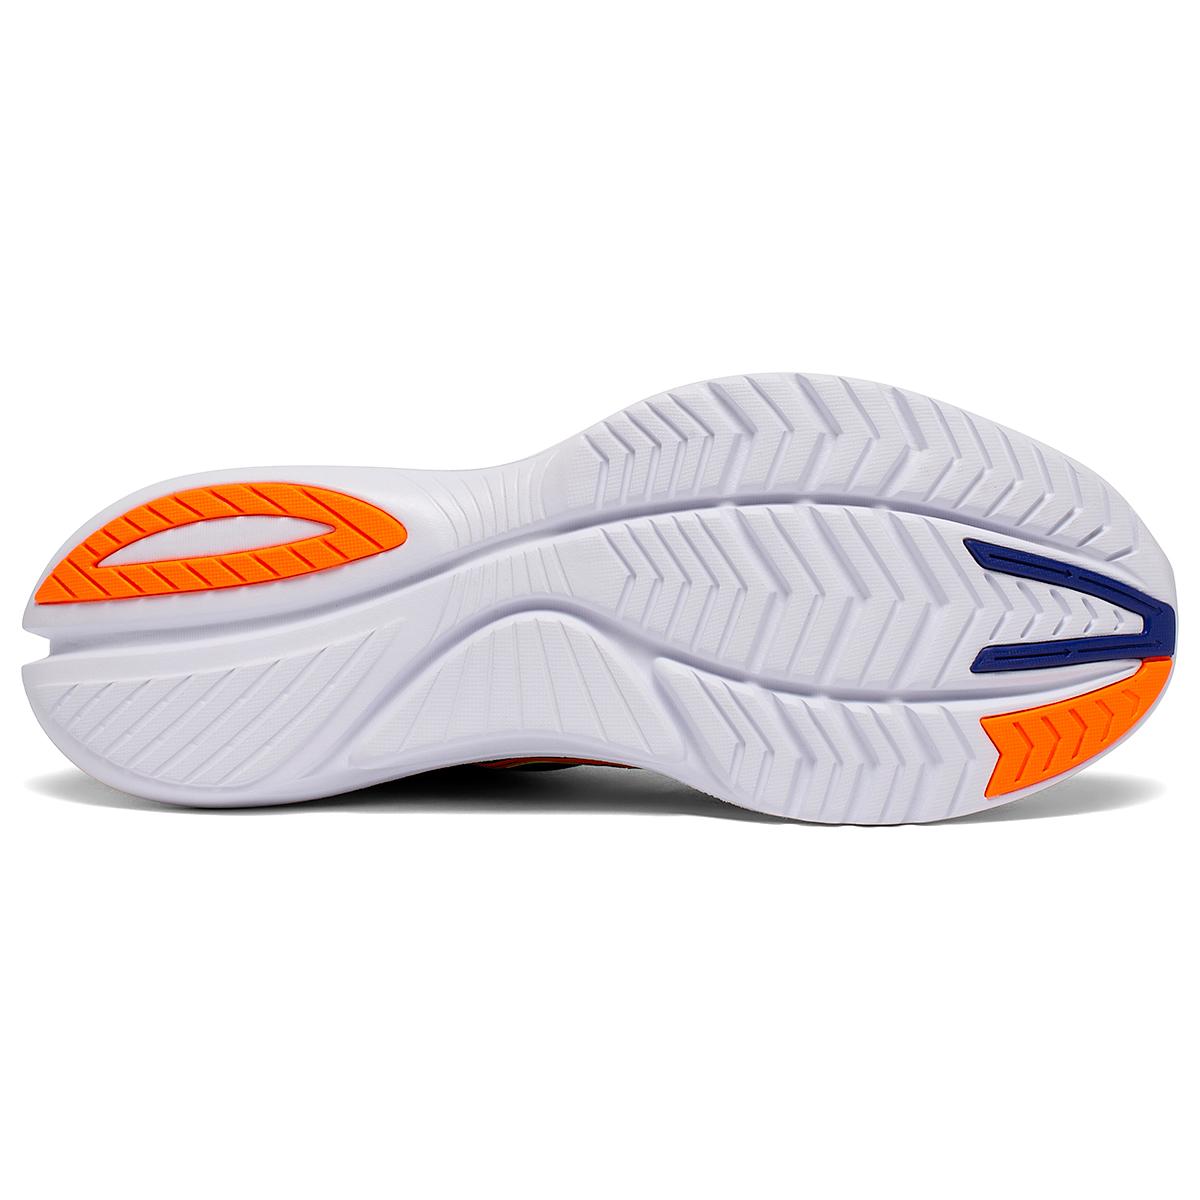 Men's Saucony Kinvara 12 Running Shoe - Color: Future/Black - Size: 7 - Width: Regular, Future/Black, large, image 5